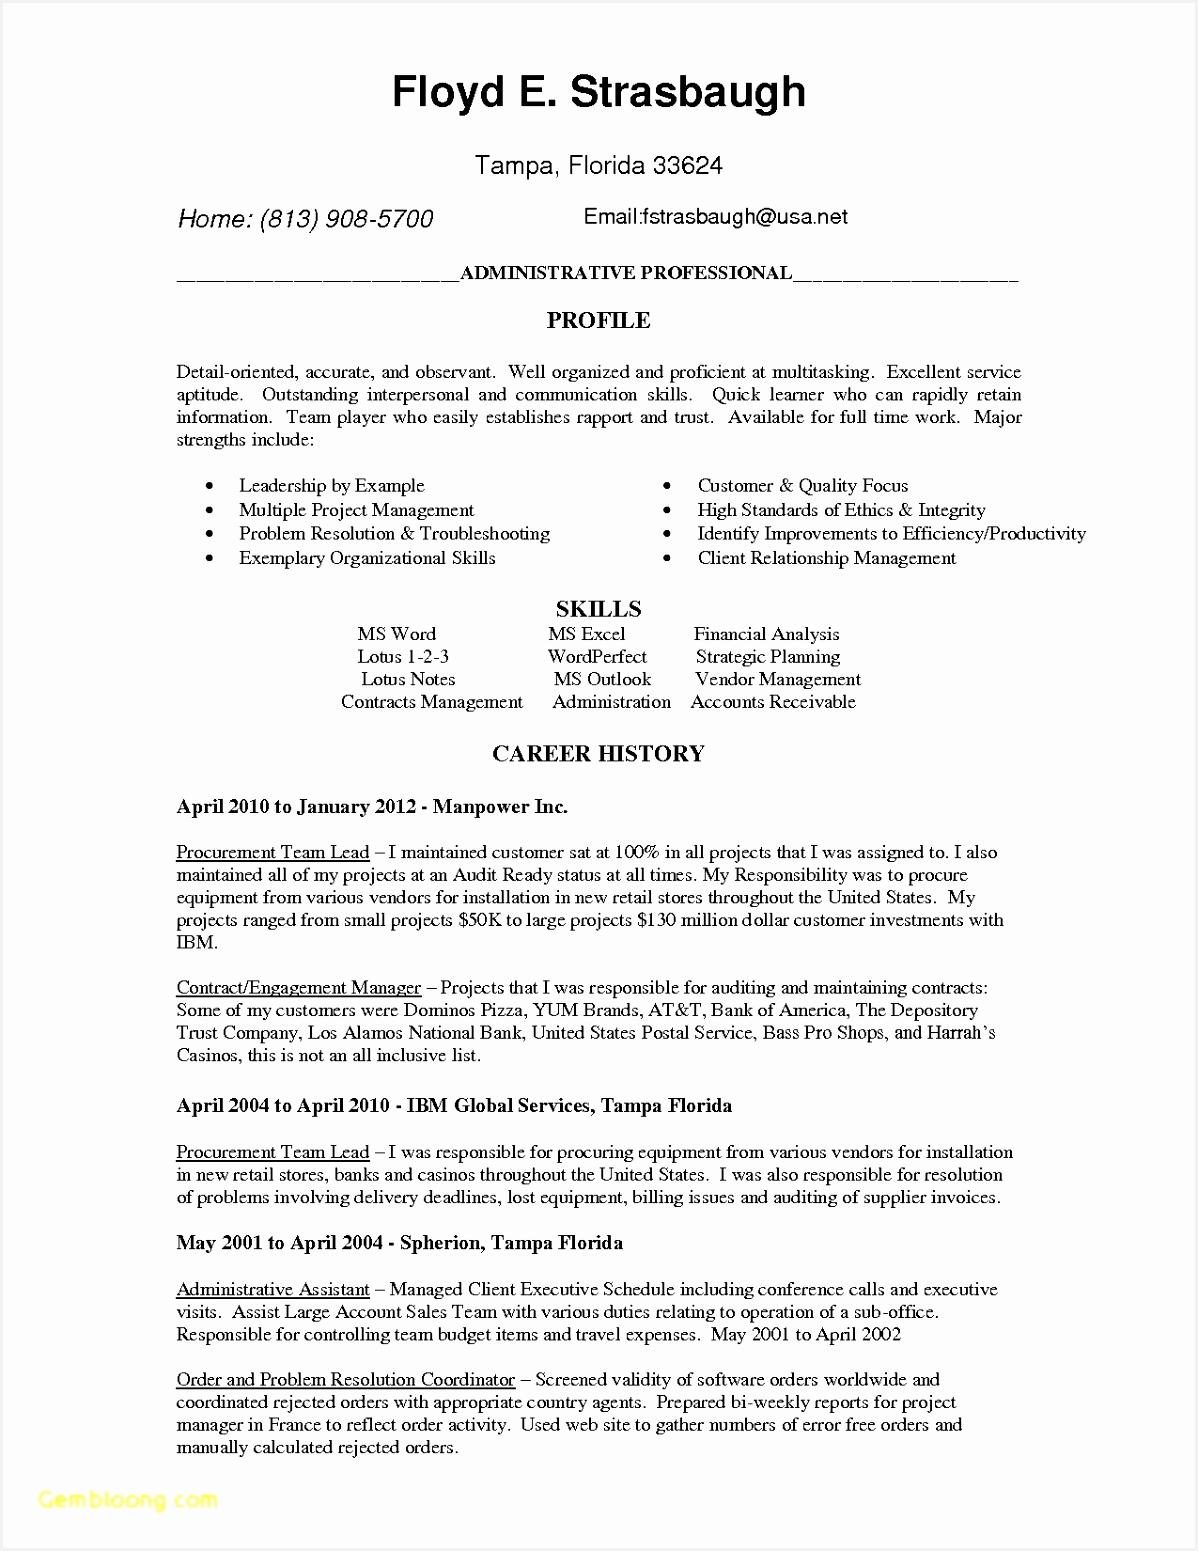 Resume Of Construction Worker Fygtv Unique Production Worker Resume Sample Beautiful Construction Worker Resume Of 4 Resume Of Construction Worker